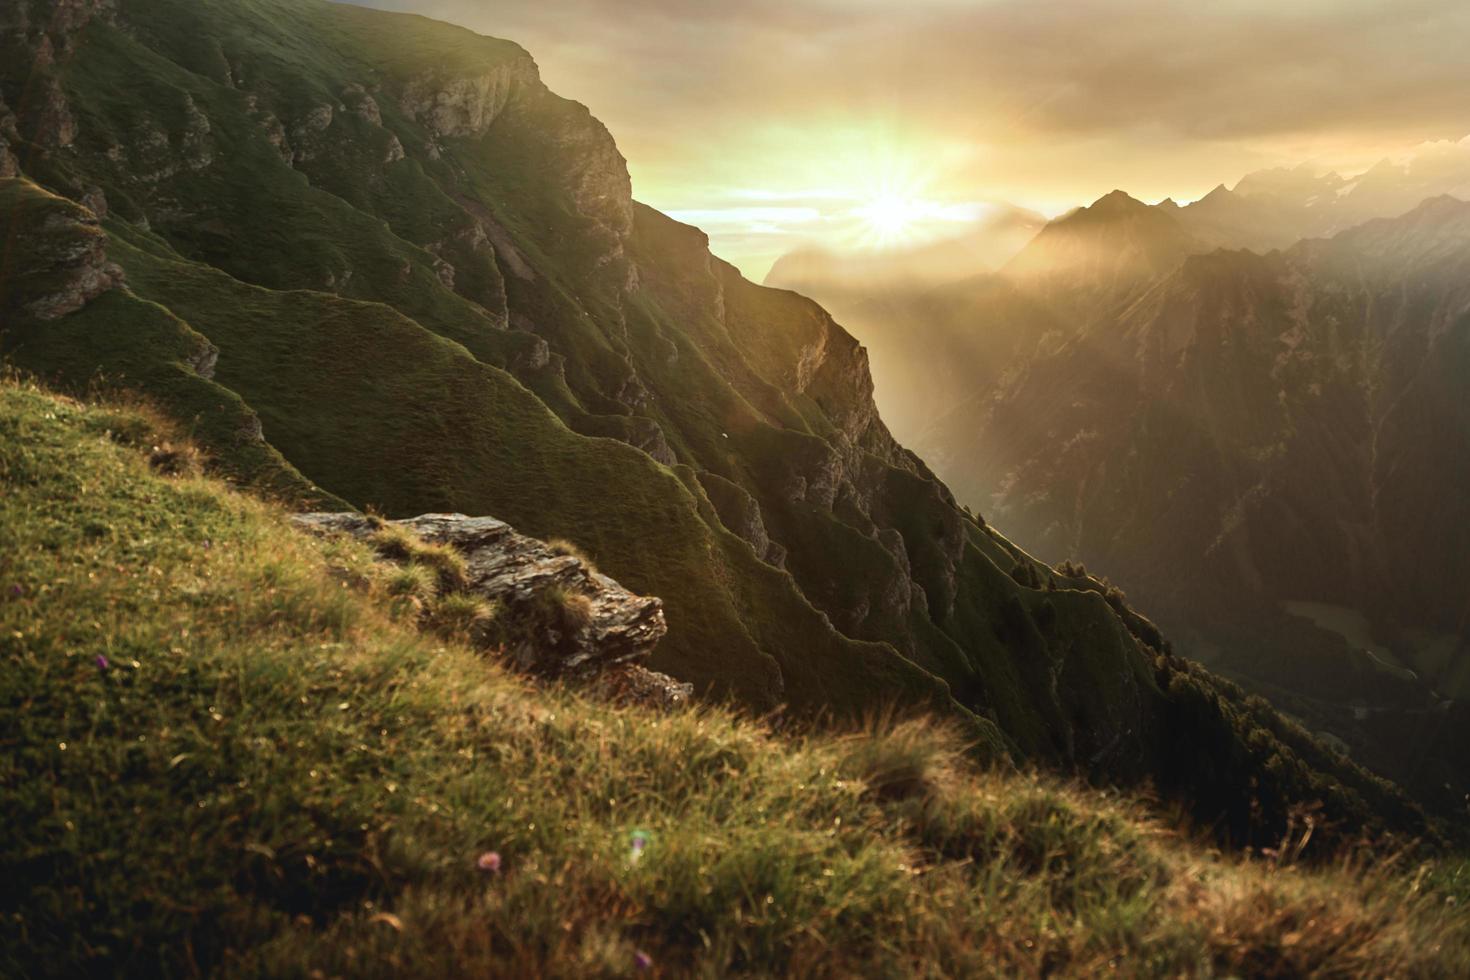 Mountains during dawn photo